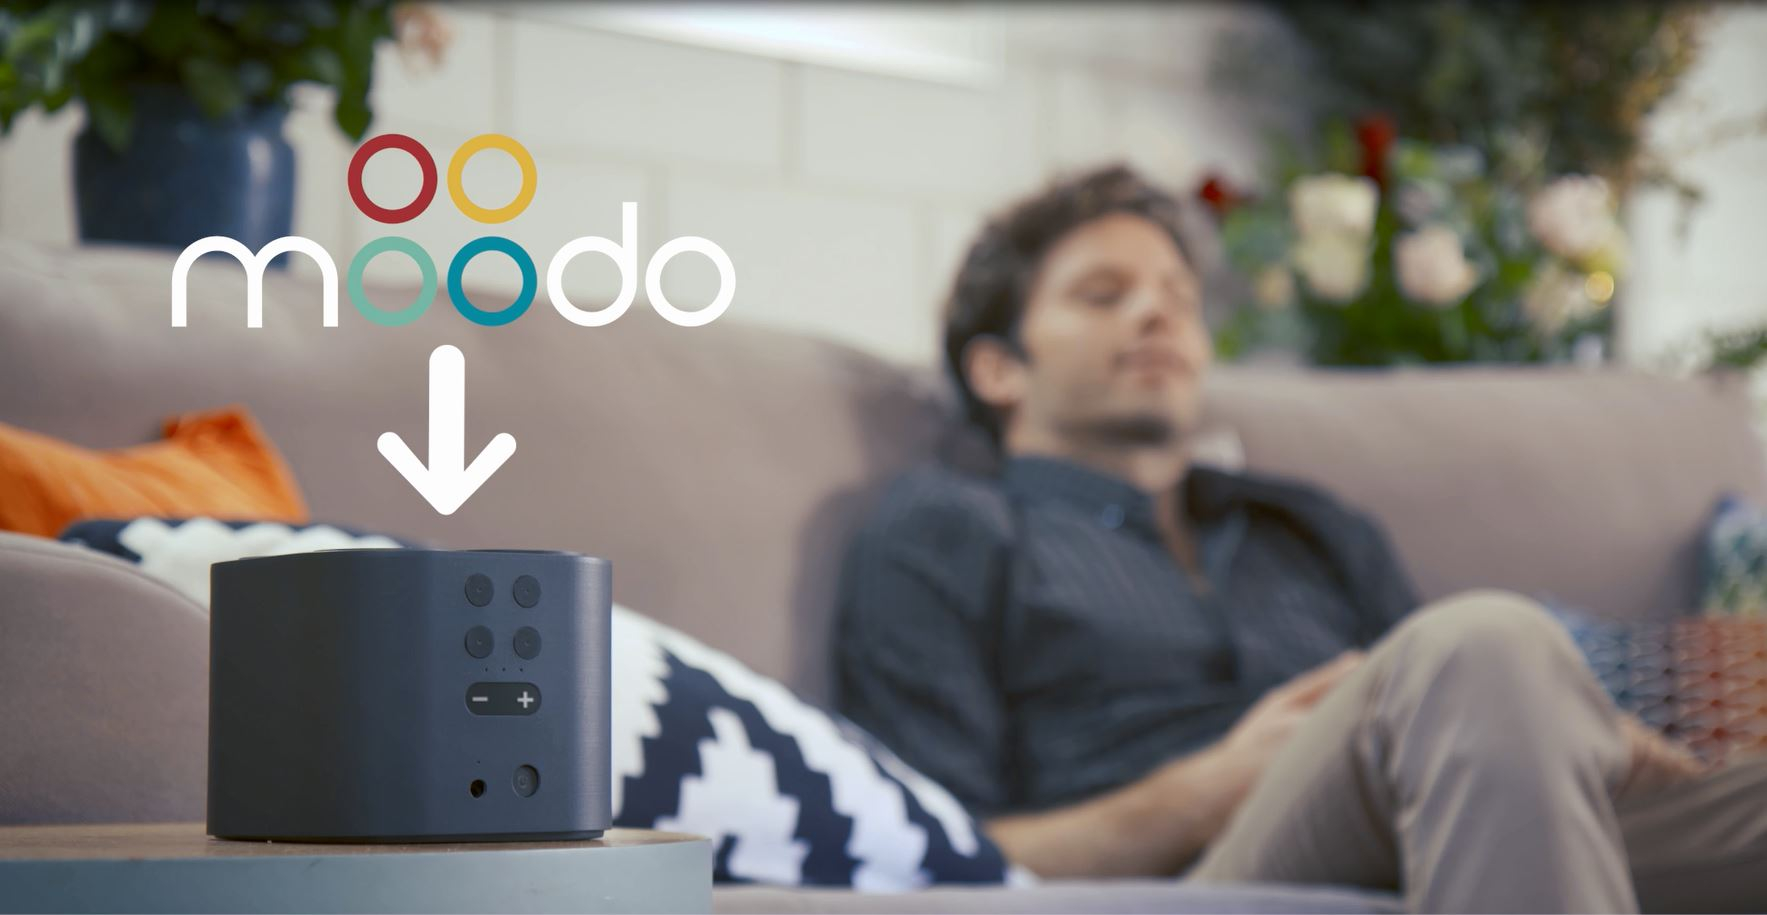 Moodo -Smart air freshener